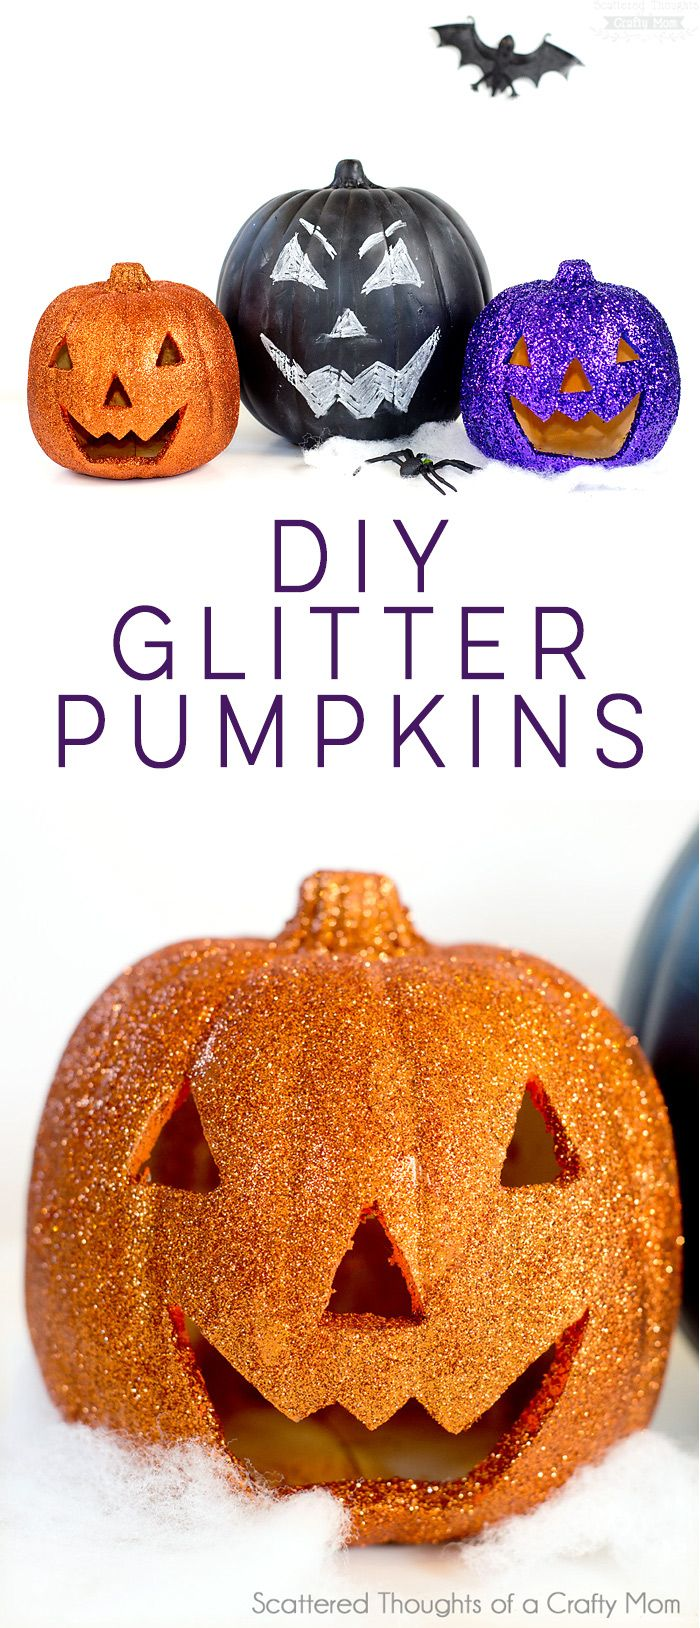 And fashion magic halloween pumpkins carving and decorating ideas - Diy Glitter Pumpkins Pumpkin Decorationshalloween Decorationshalloween Craftshalloween Ideasroom Decorationscarved